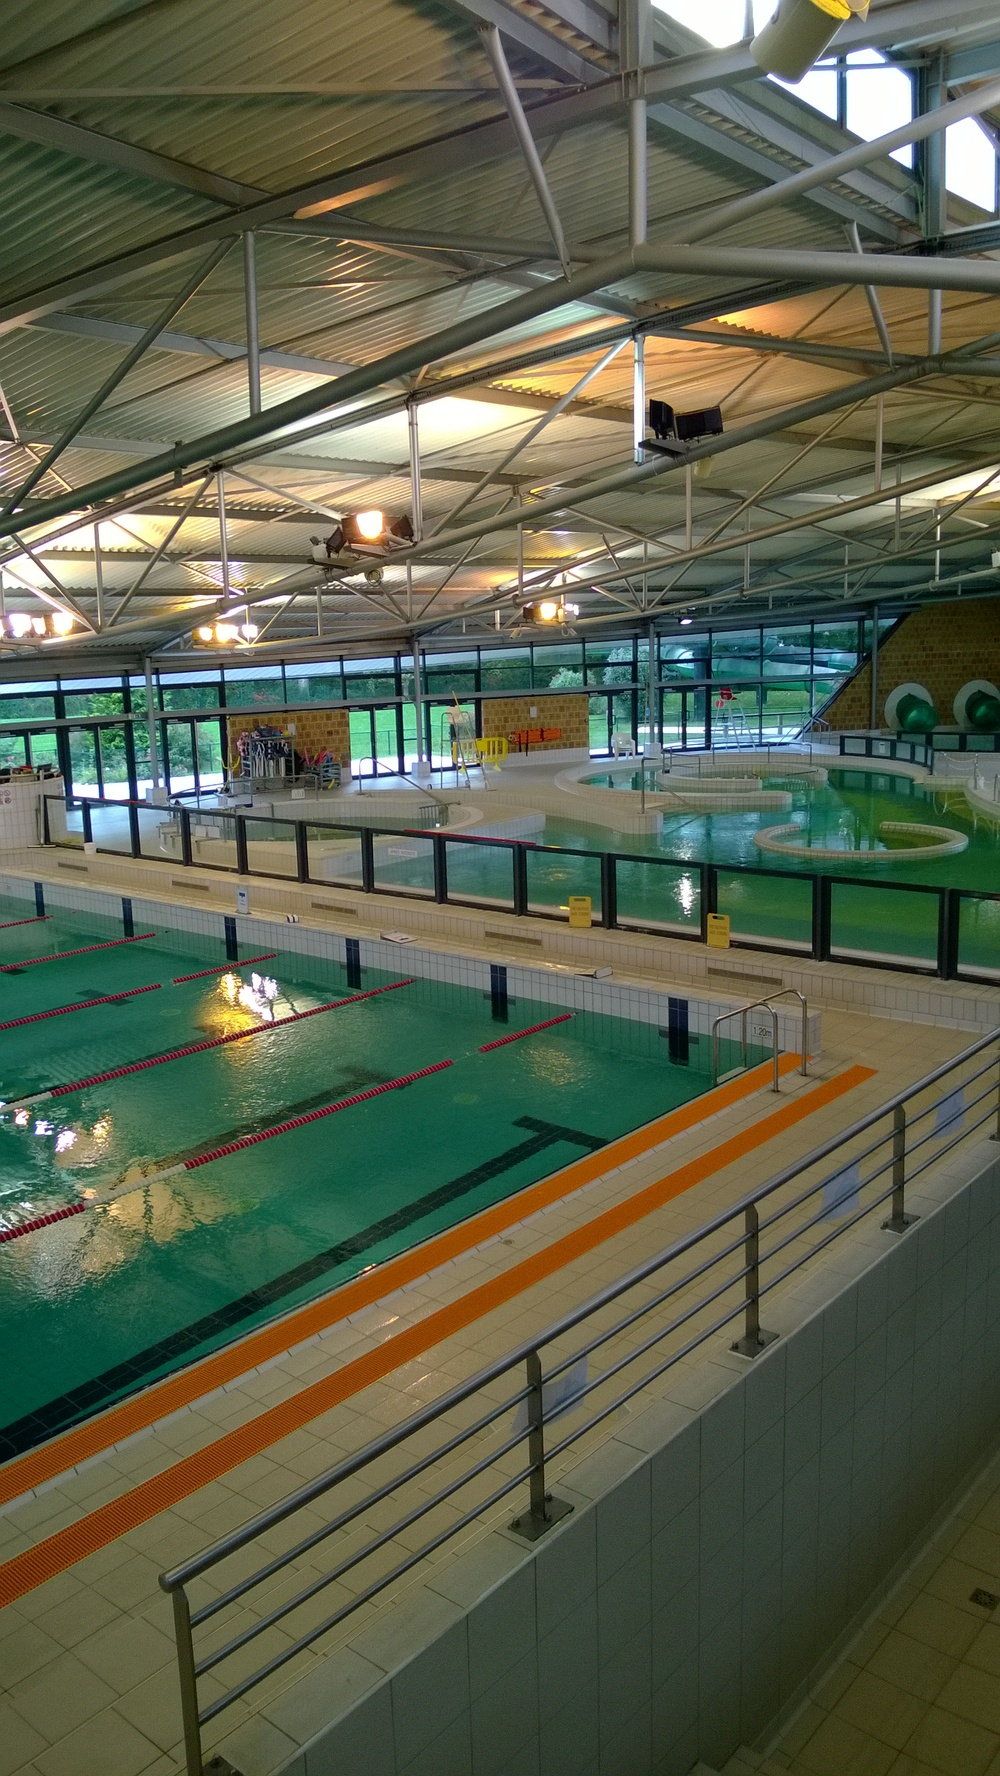 centre aquatique de montigny le bretonneux